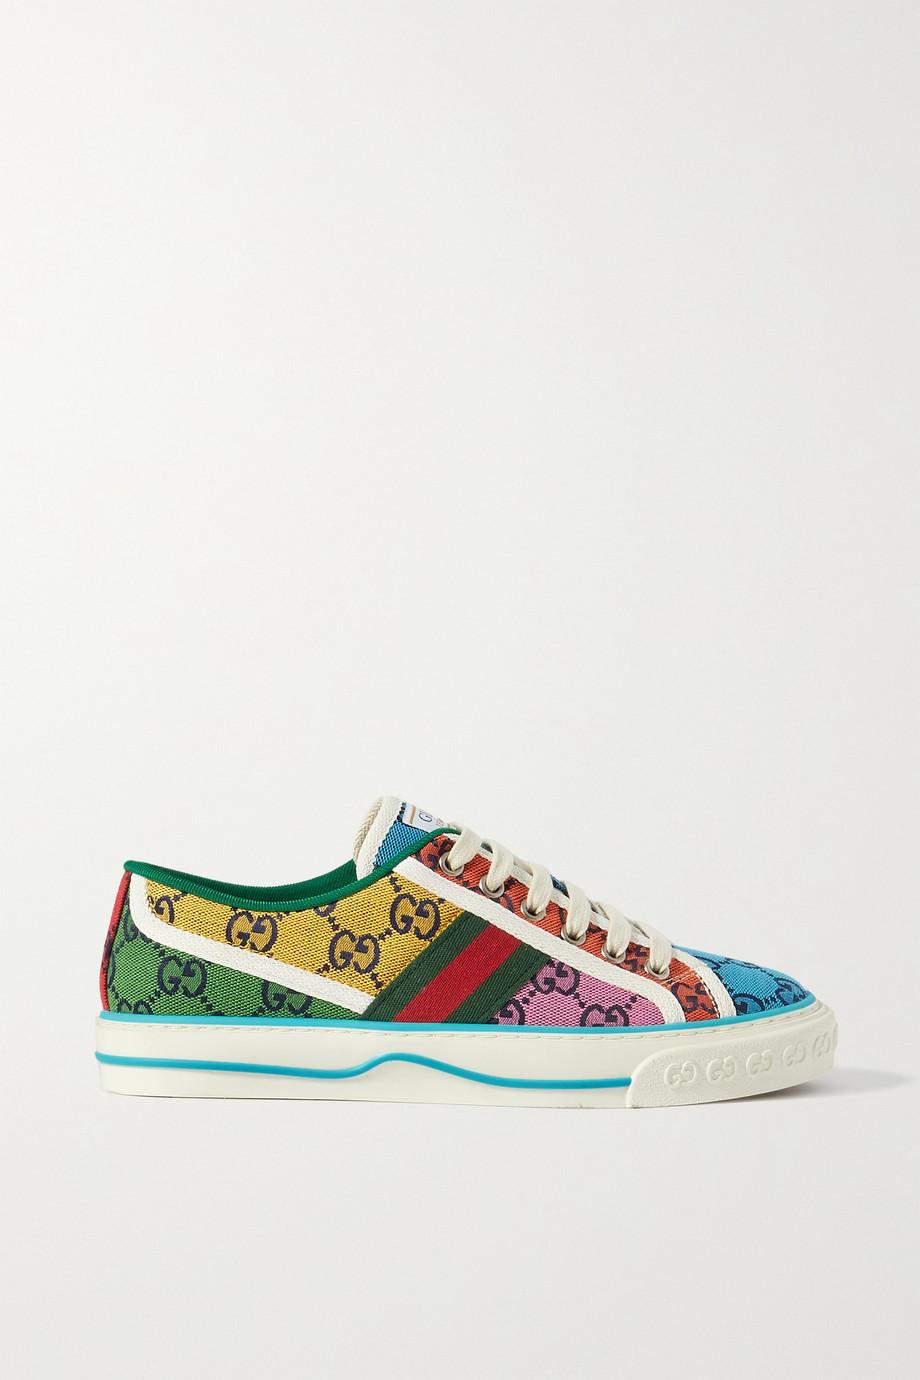 Gucci GG Multicolour Tennis 1977 Sneakers aus Canvas mit Logomuster